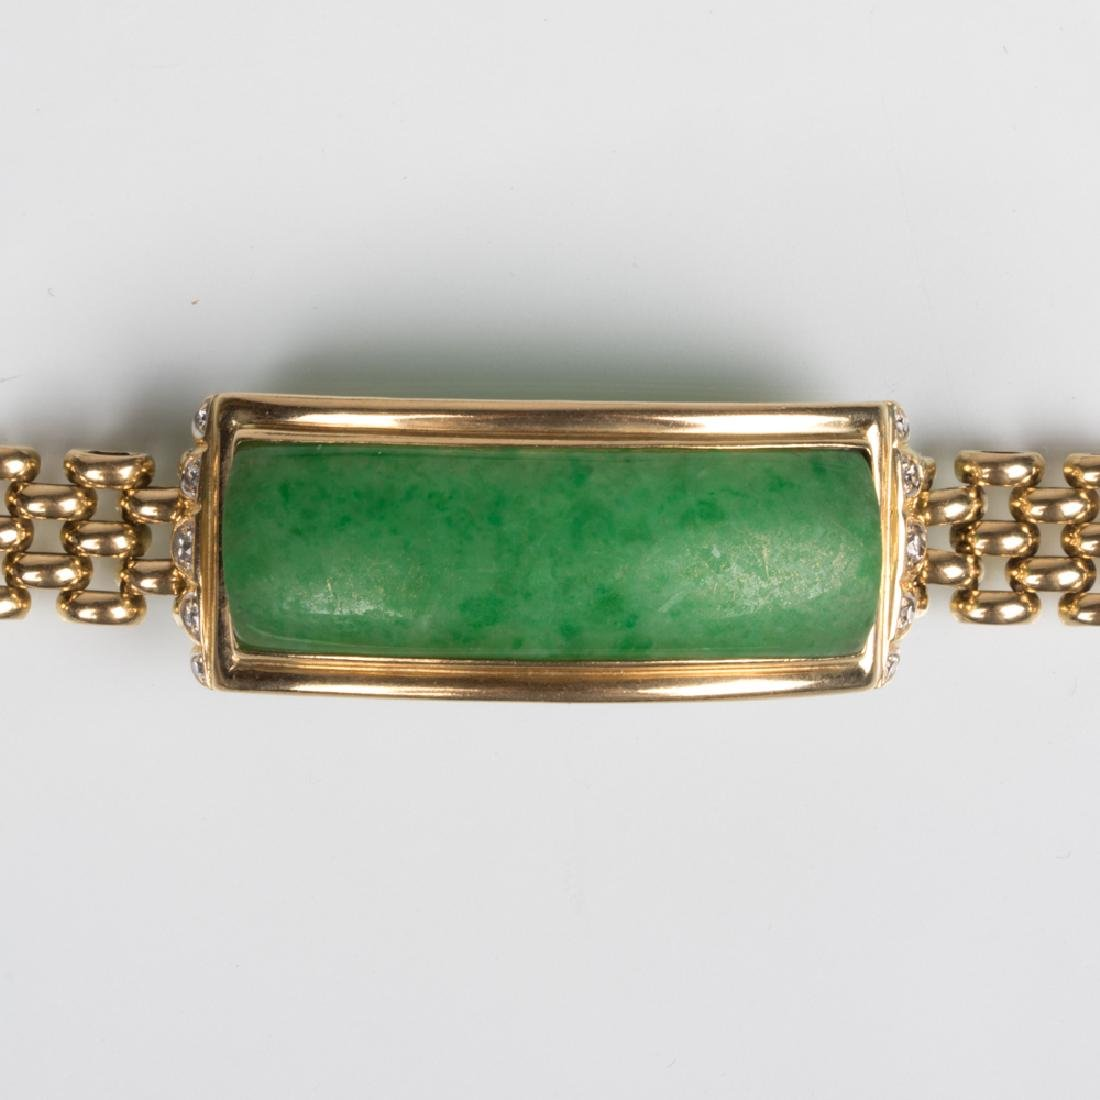 A 14kt. Yellow Gold, Green Jade and Diamond Bracelet,